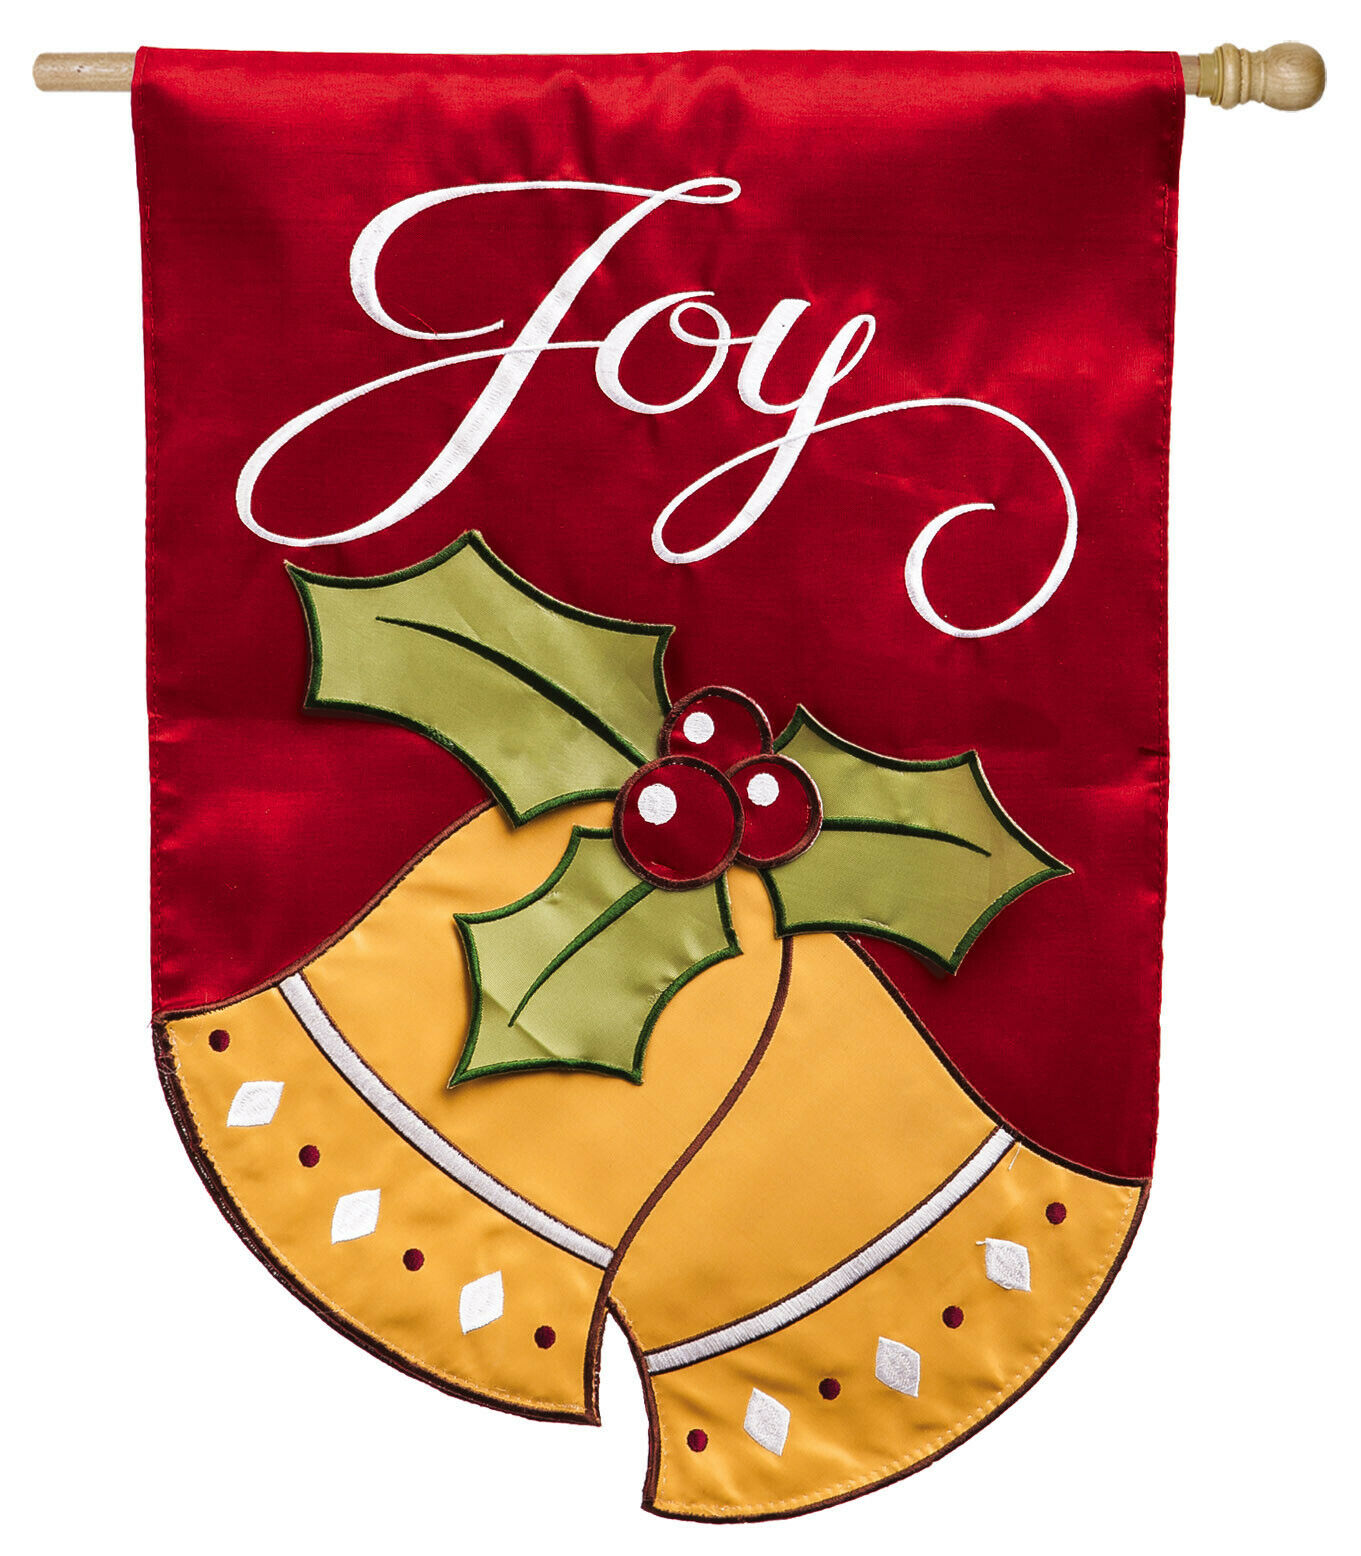 evergreen-flag-applique-joyful-christmas-bells-house-flag-28-x-44-inches